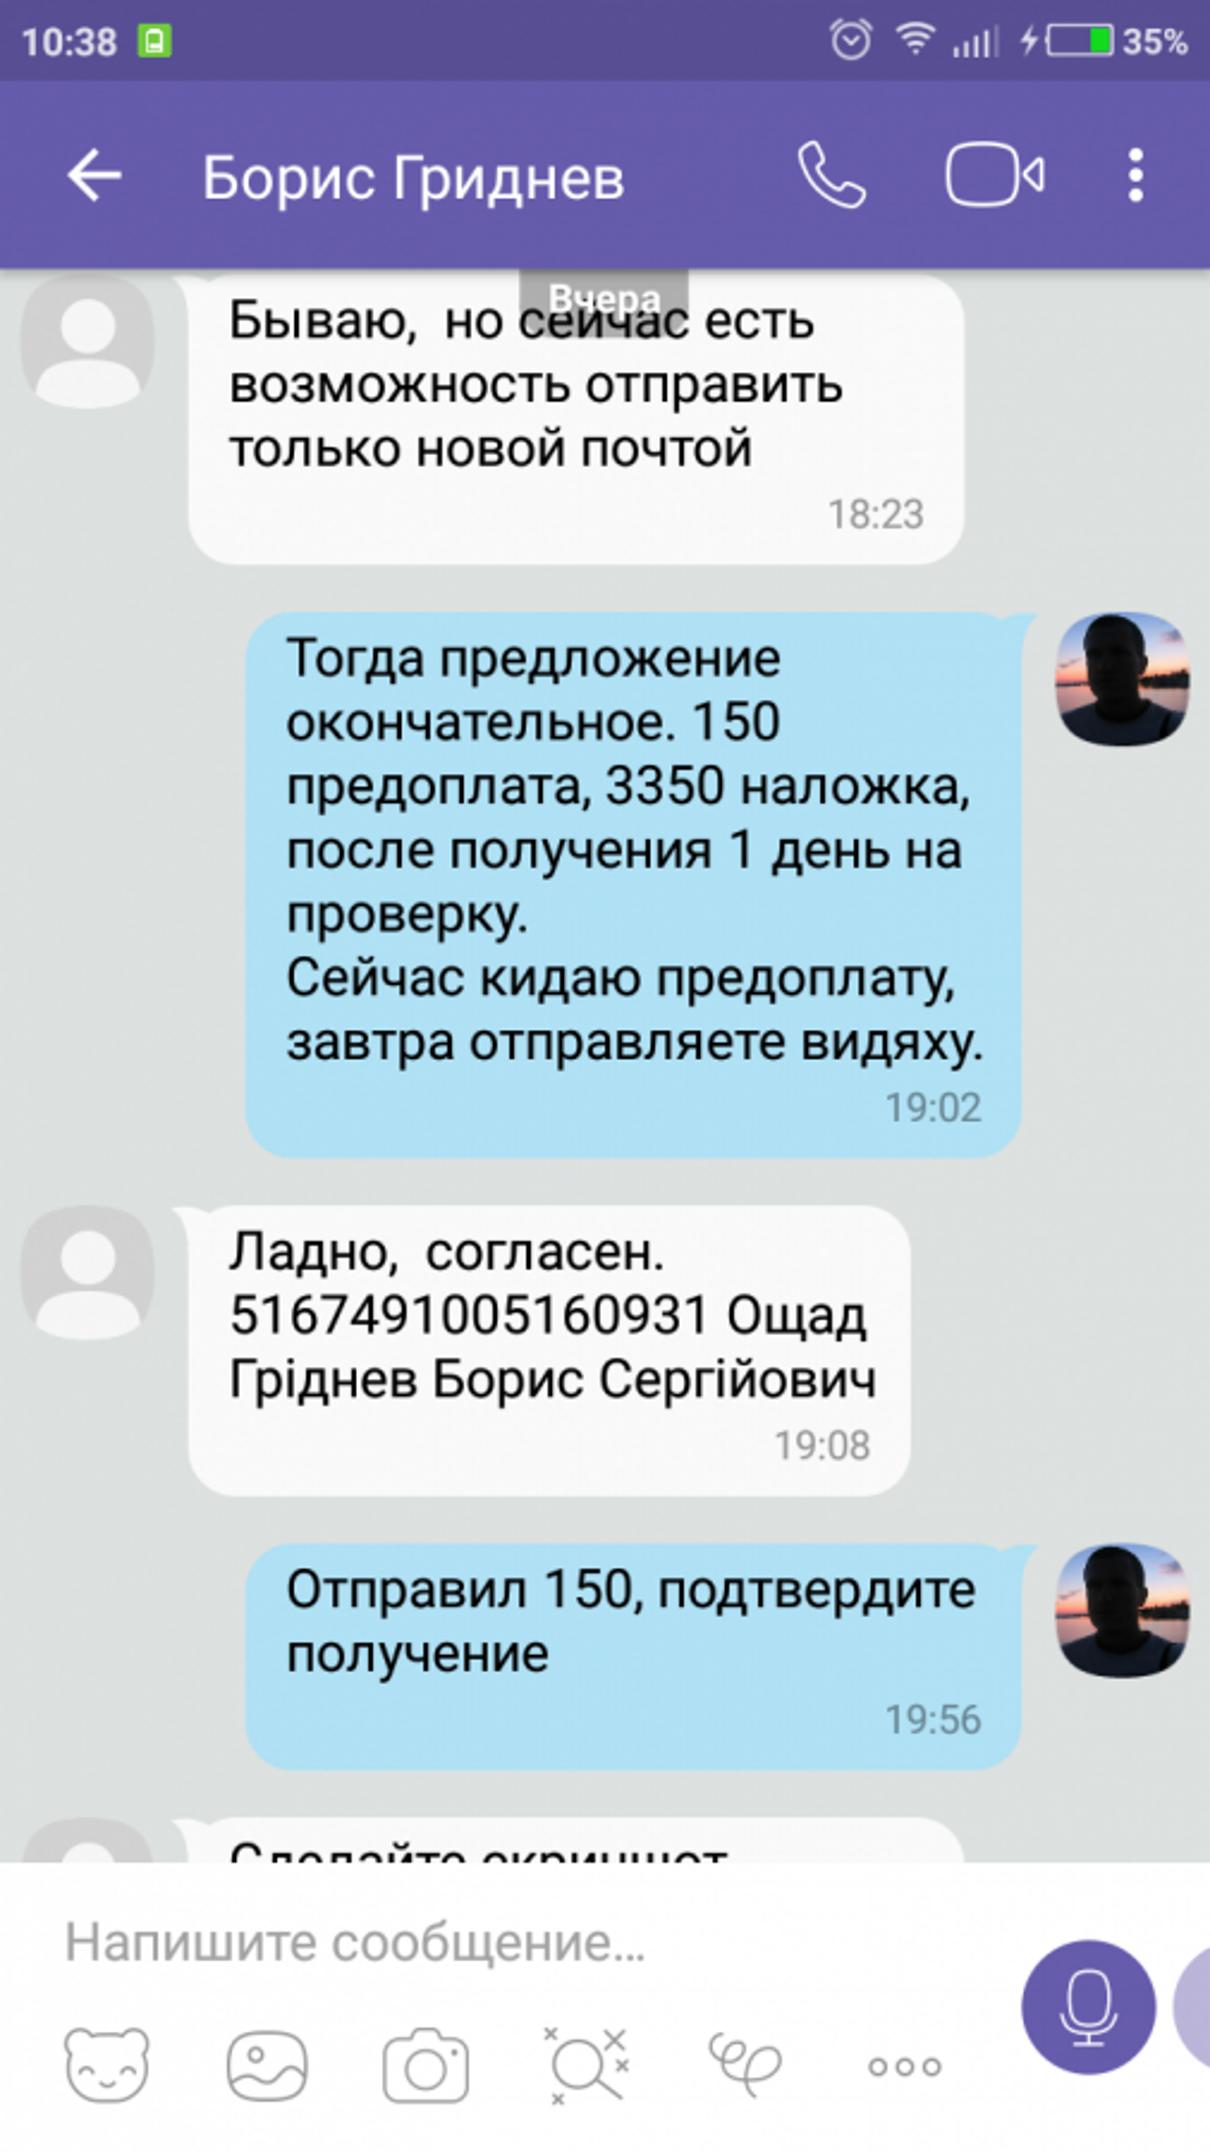 Жалоба-отзыв: Борис Гриднев - Мошенник с OLX, кидает на предоплату.  Фото №3